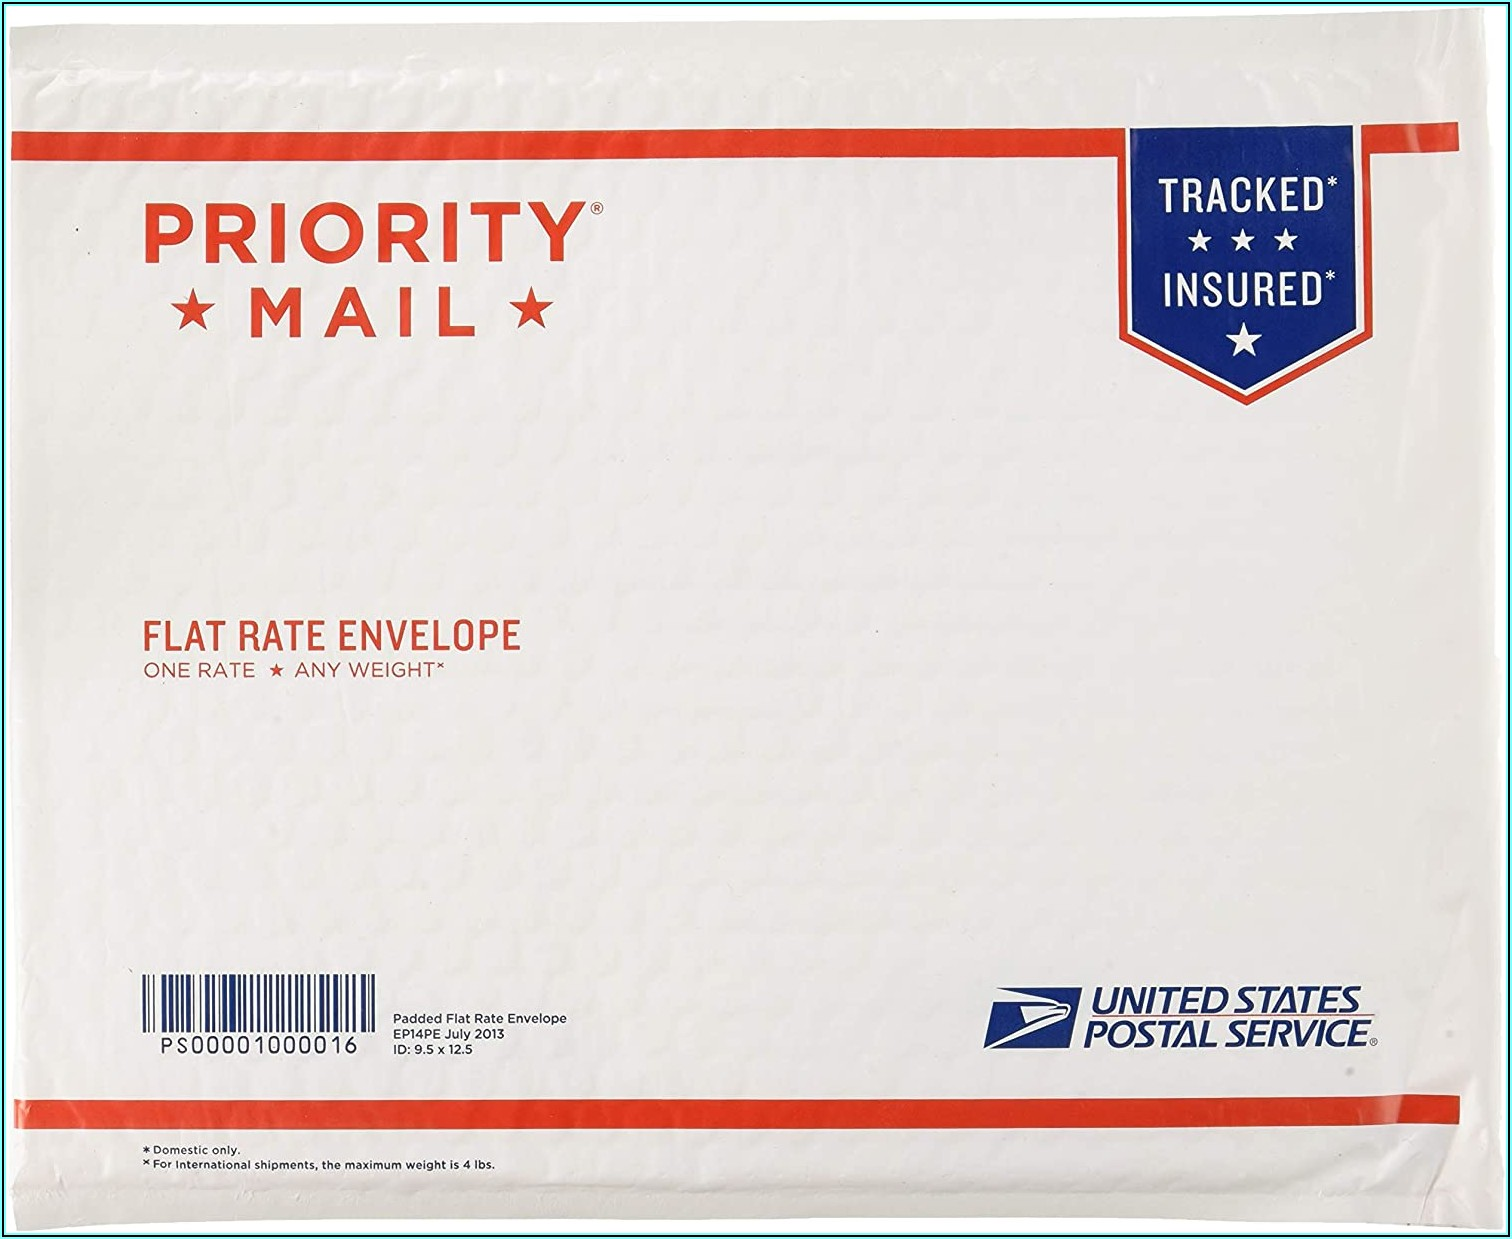 Usps Priority Mail Envelopes Sizes